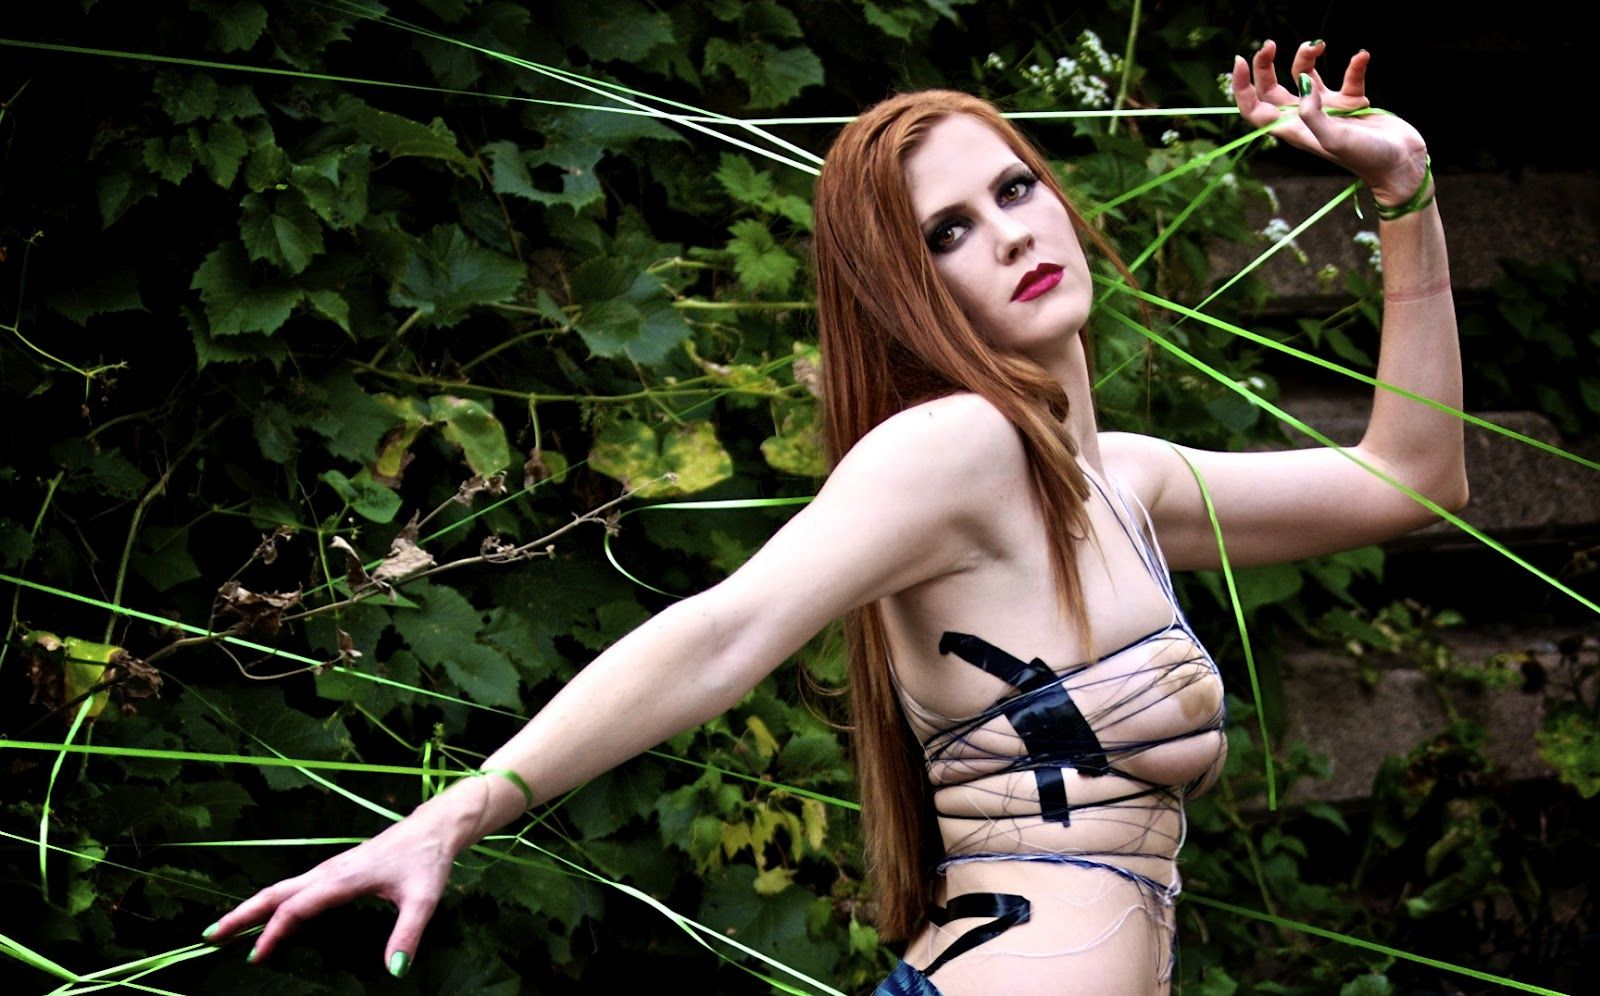 Celebrity Karen Alloy nudes (97 photos), Topless, Leaked, Selfie, butt 2018